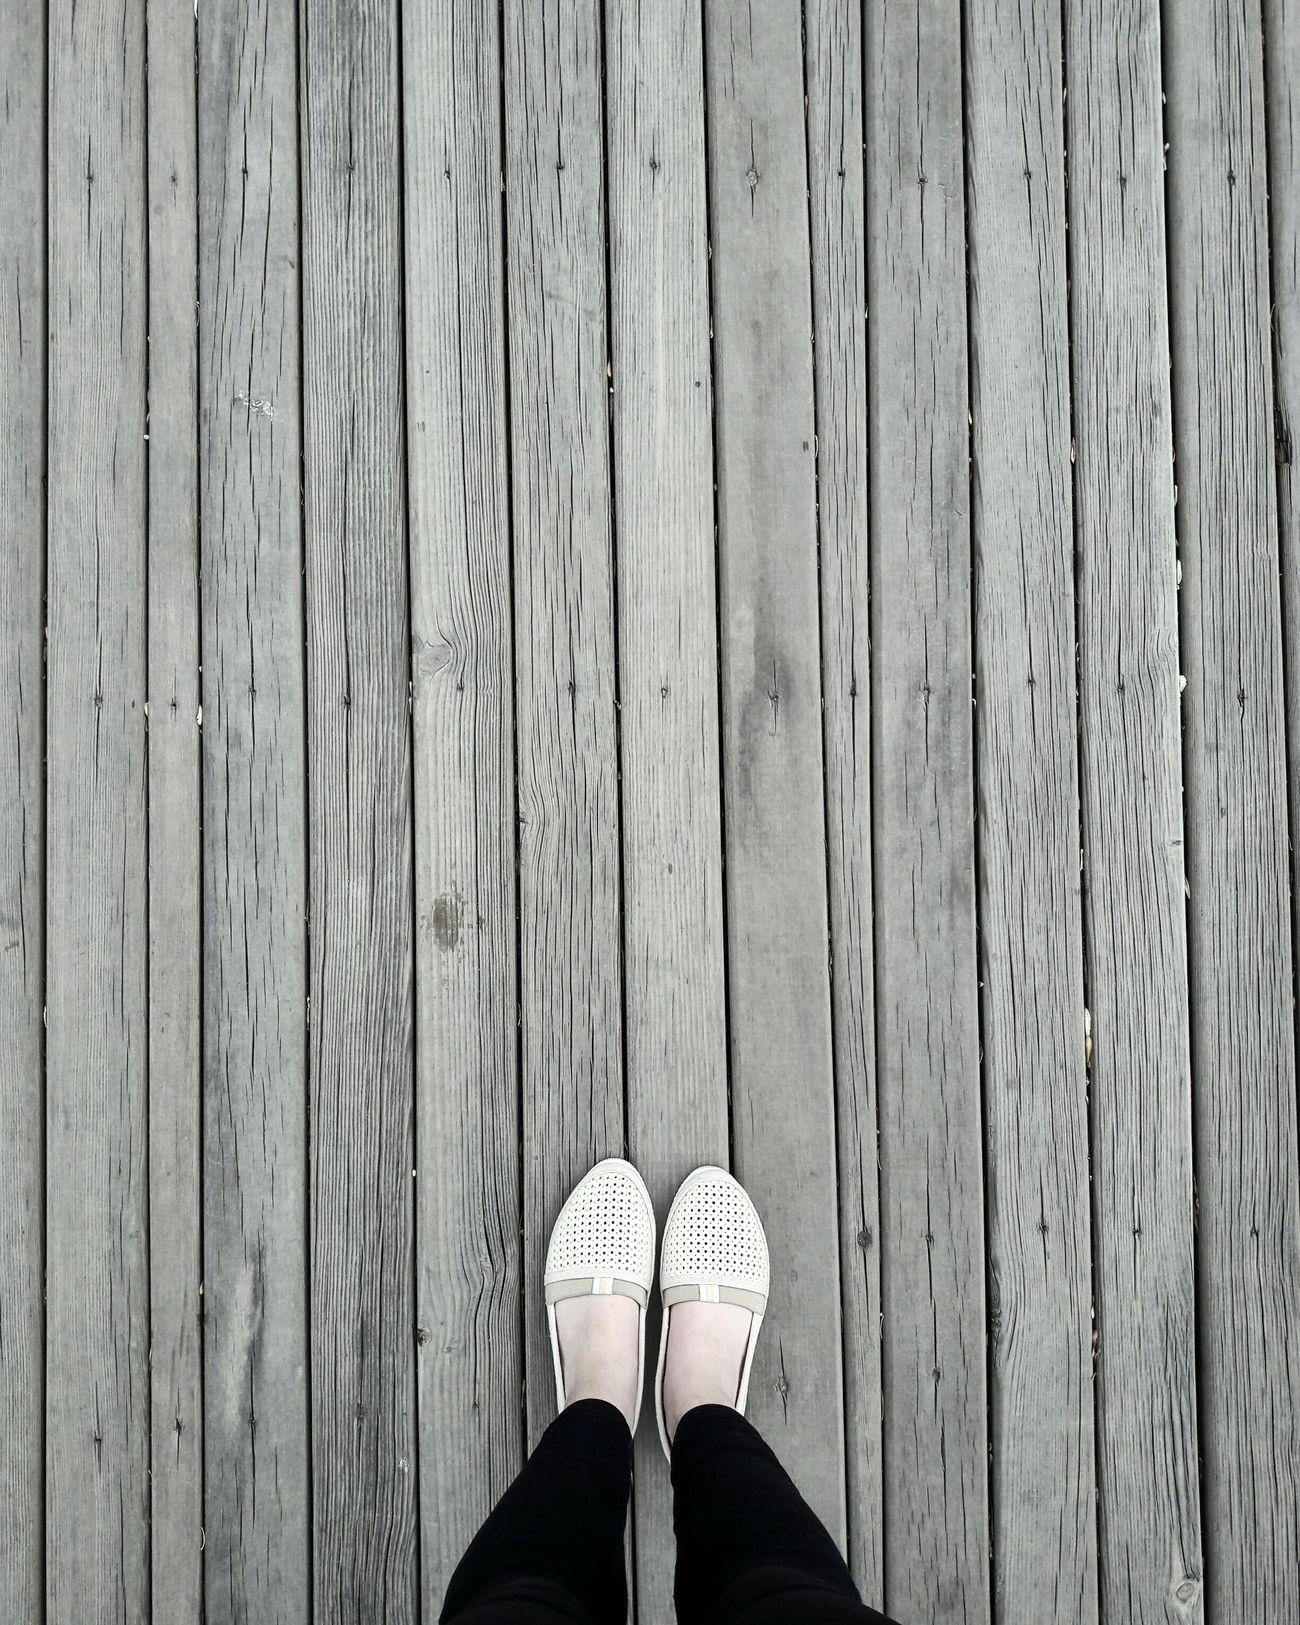 Wood - Material Human Leg Lifestyles Women Only Women Human Body Part Foot Following Followme Takipedin Takip NİSAN April Türkiye Turkey Göksu Park Ankara Eryaman Wood